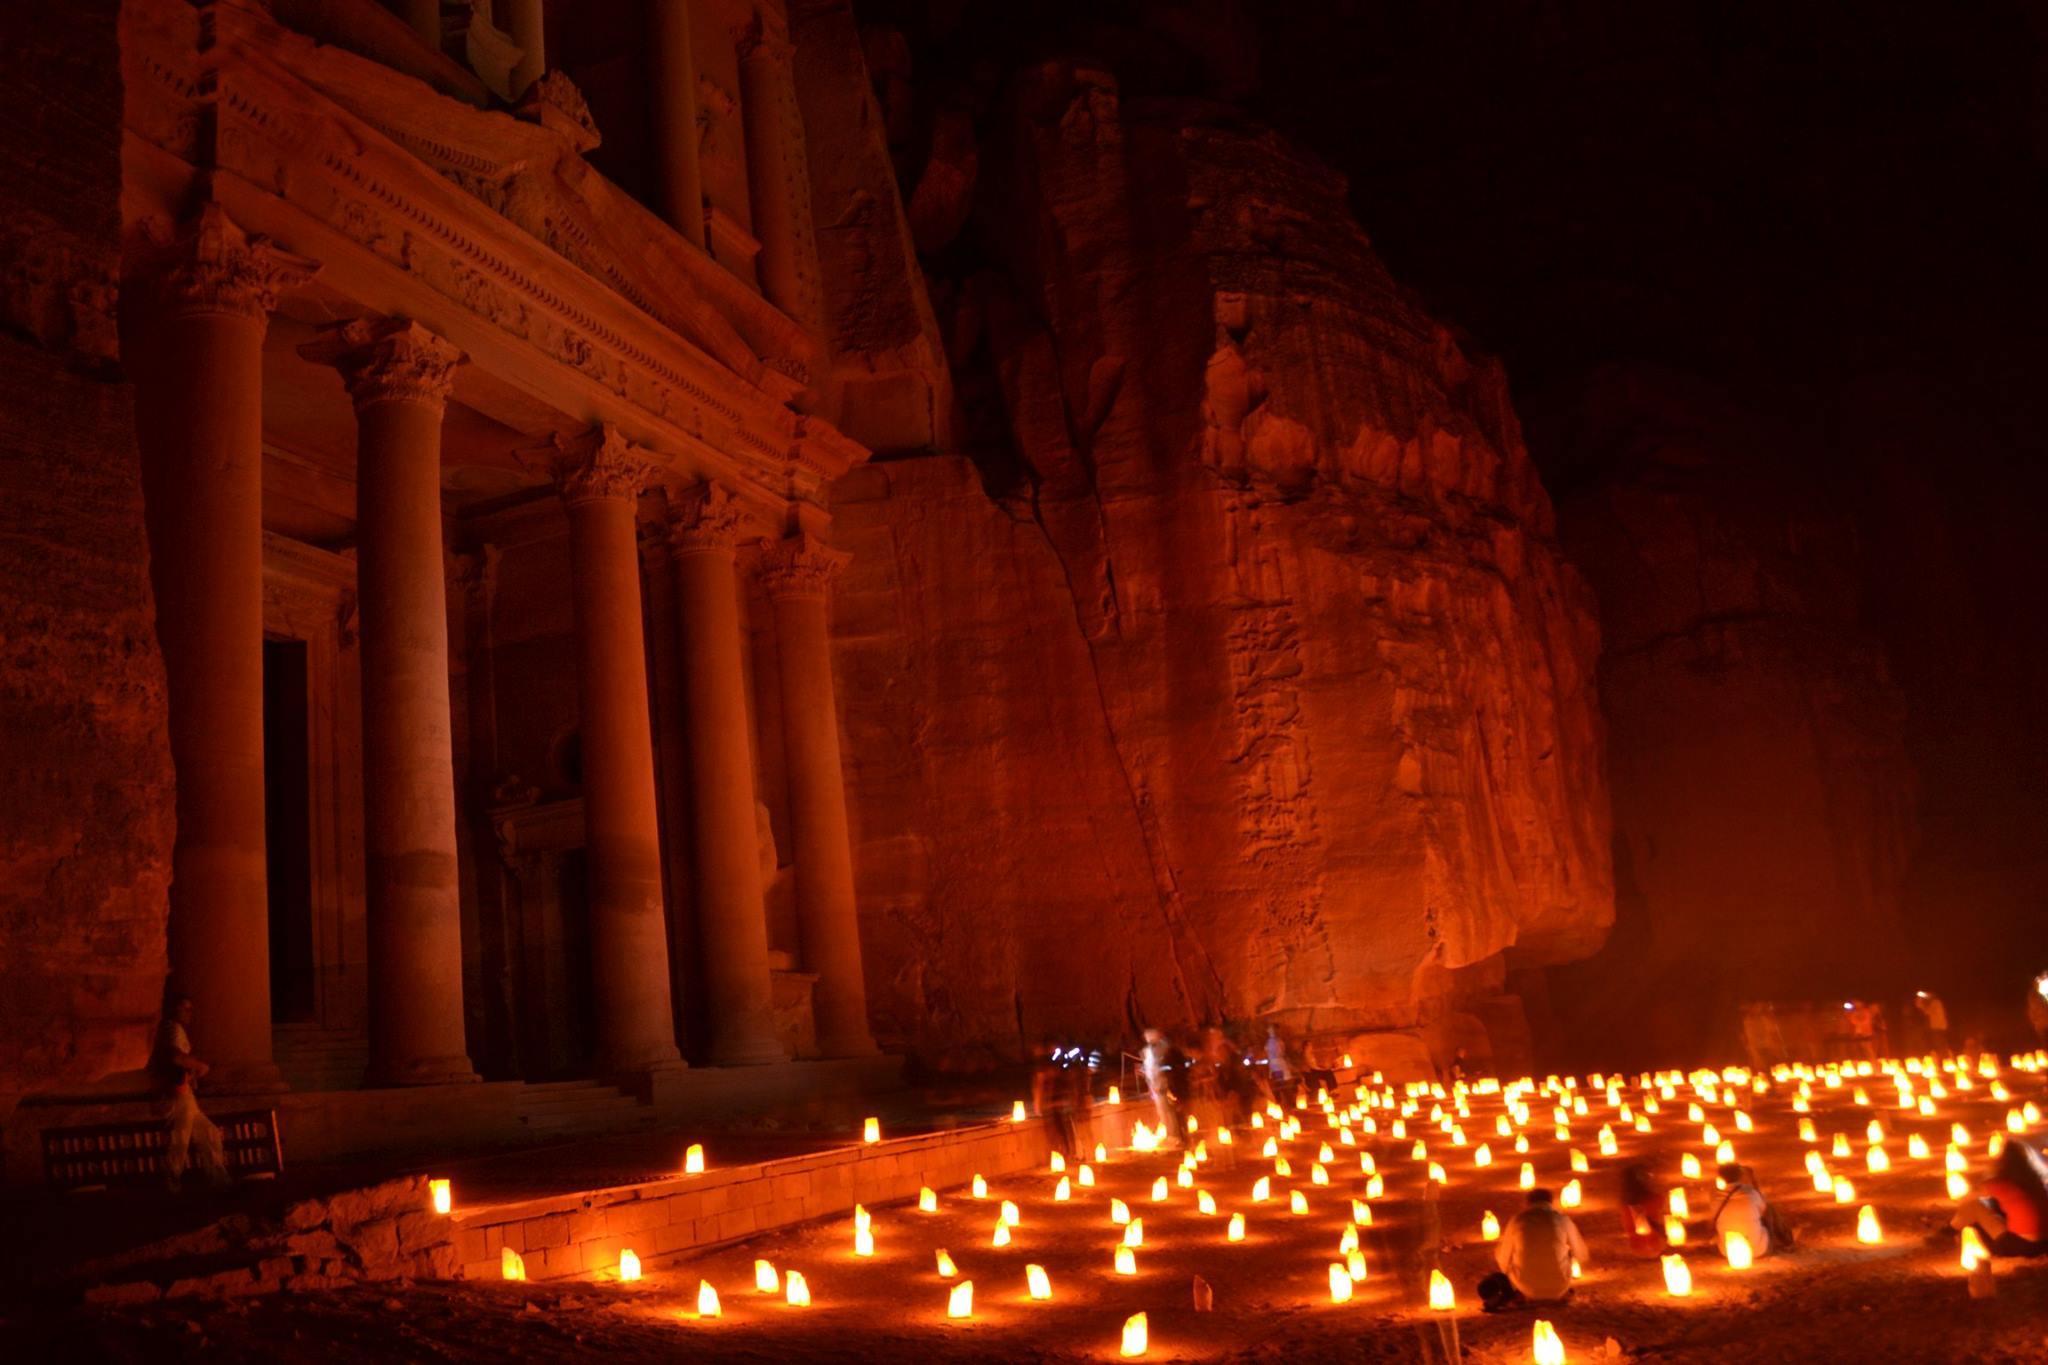 the treasury at petra lit by candles at night